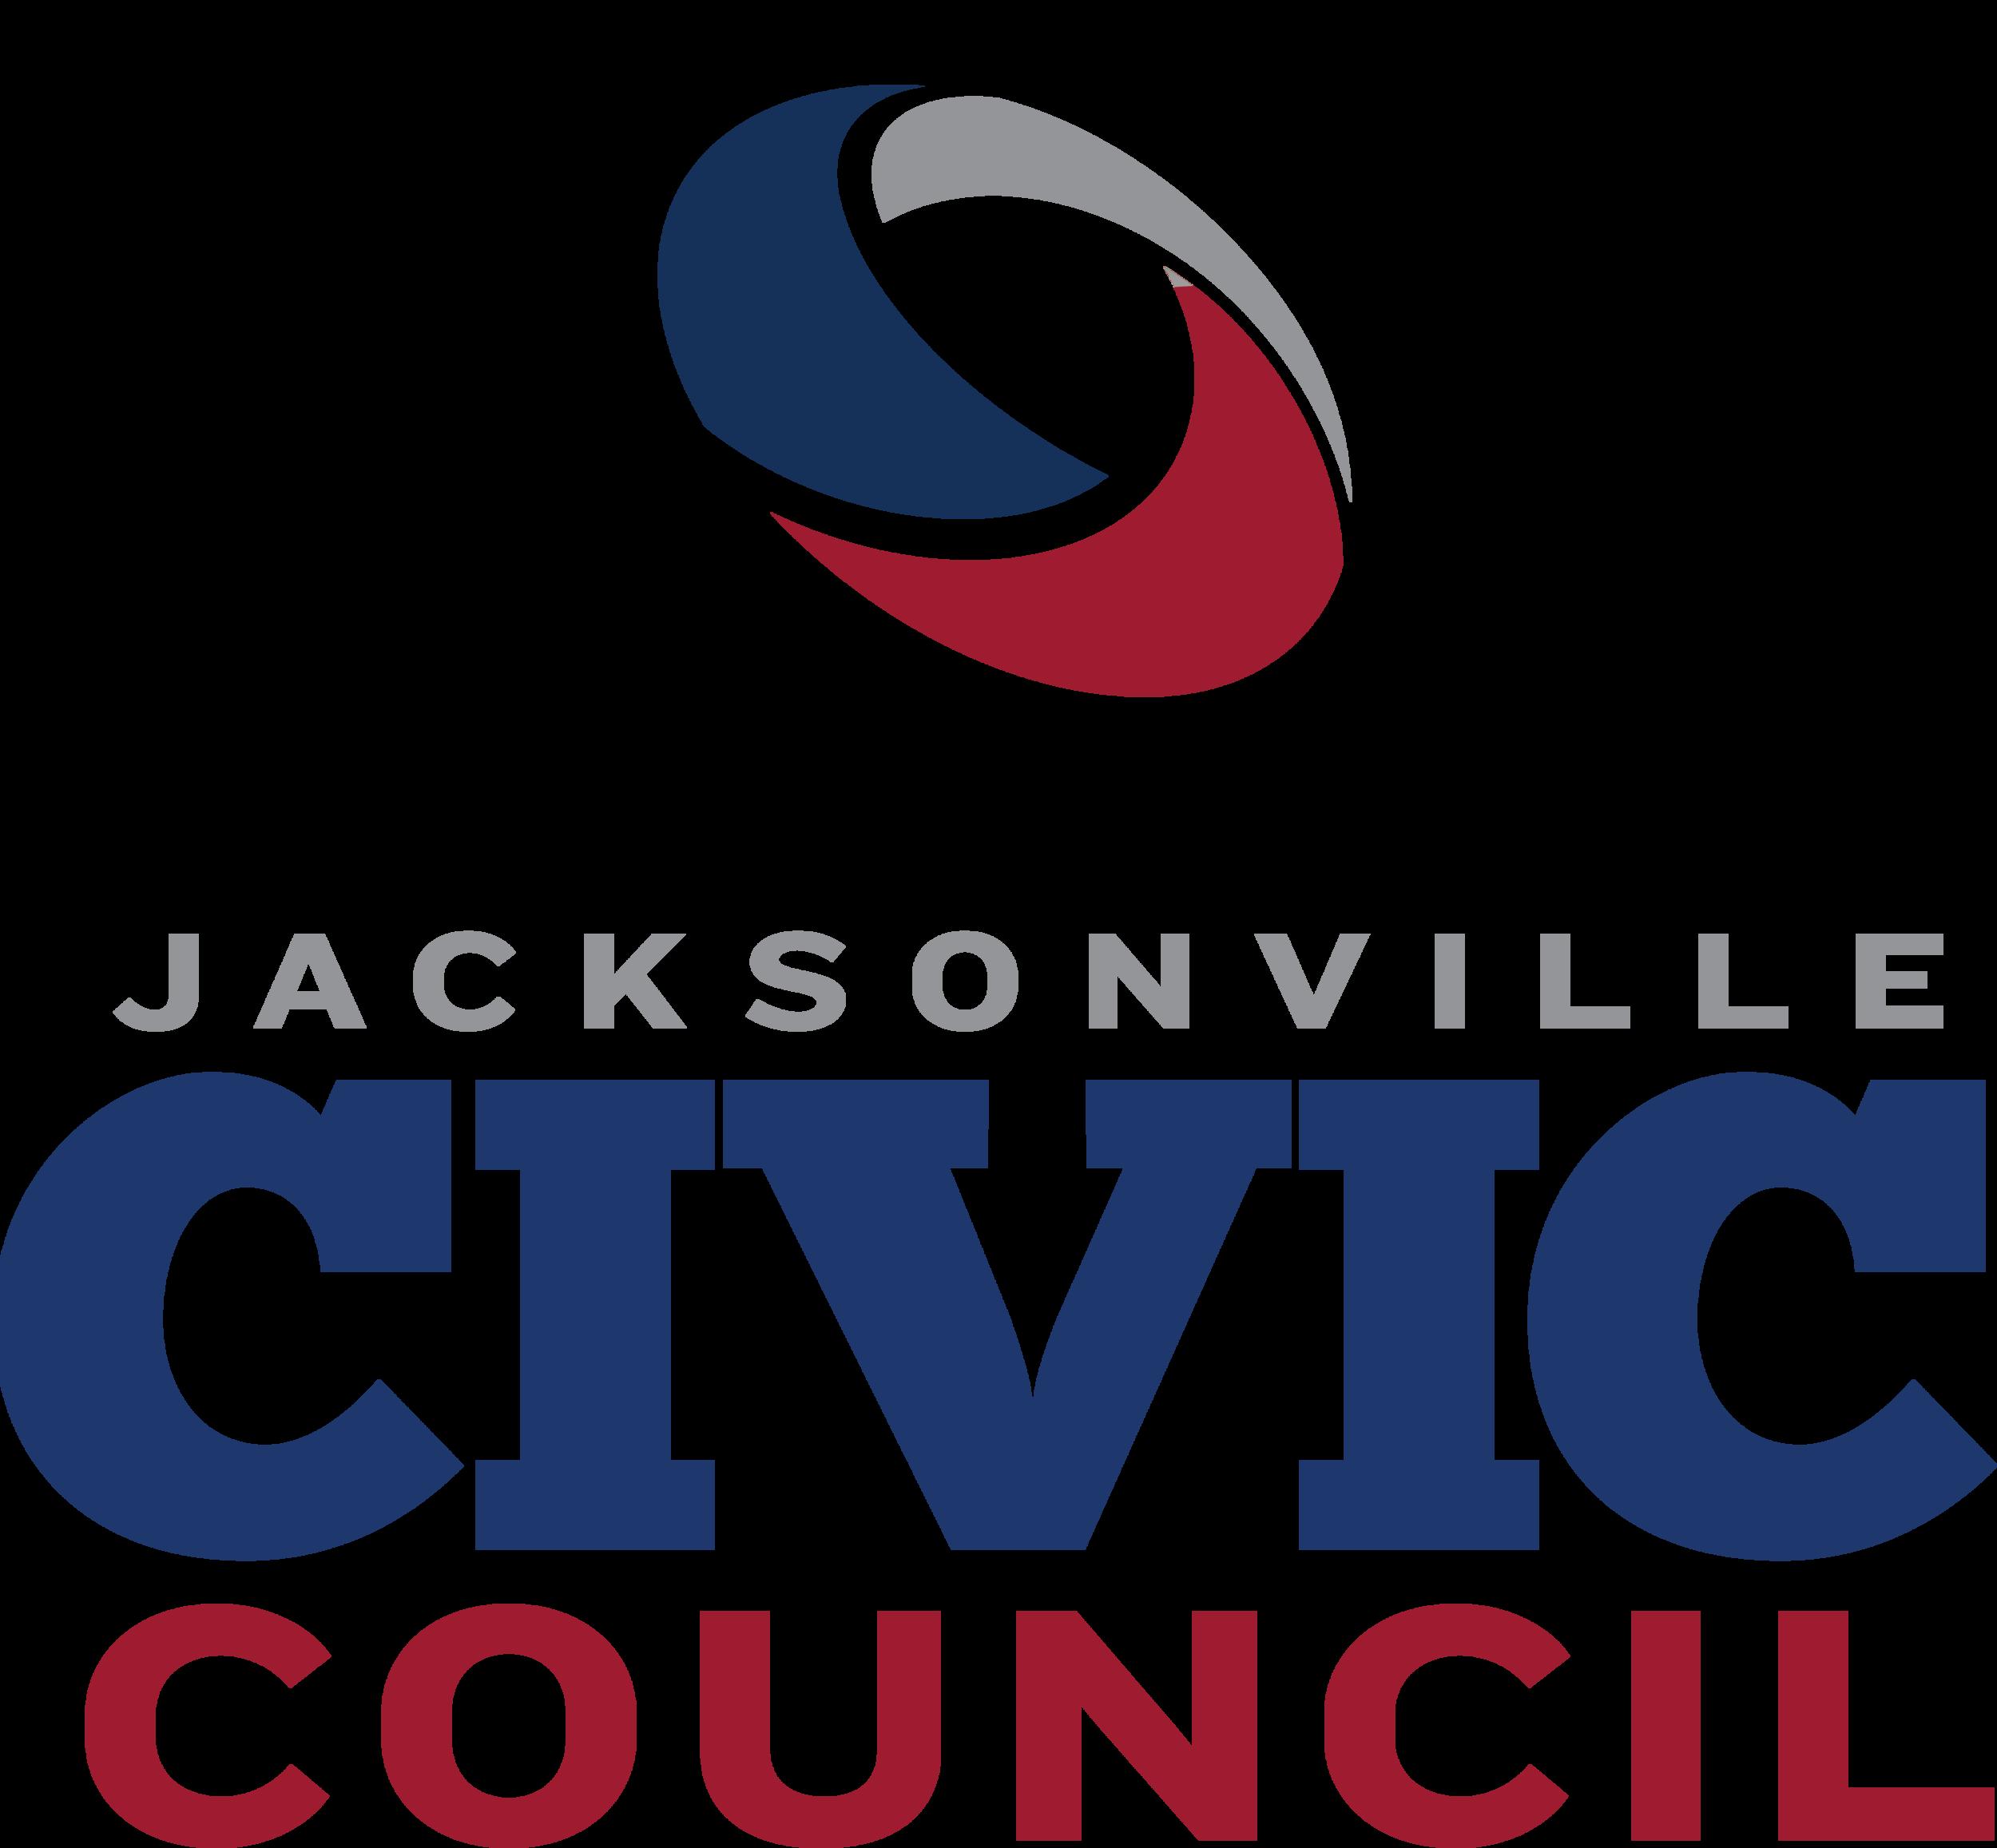 JCC15-014604_CivicCouncil_Logos_PMS(M)2.png